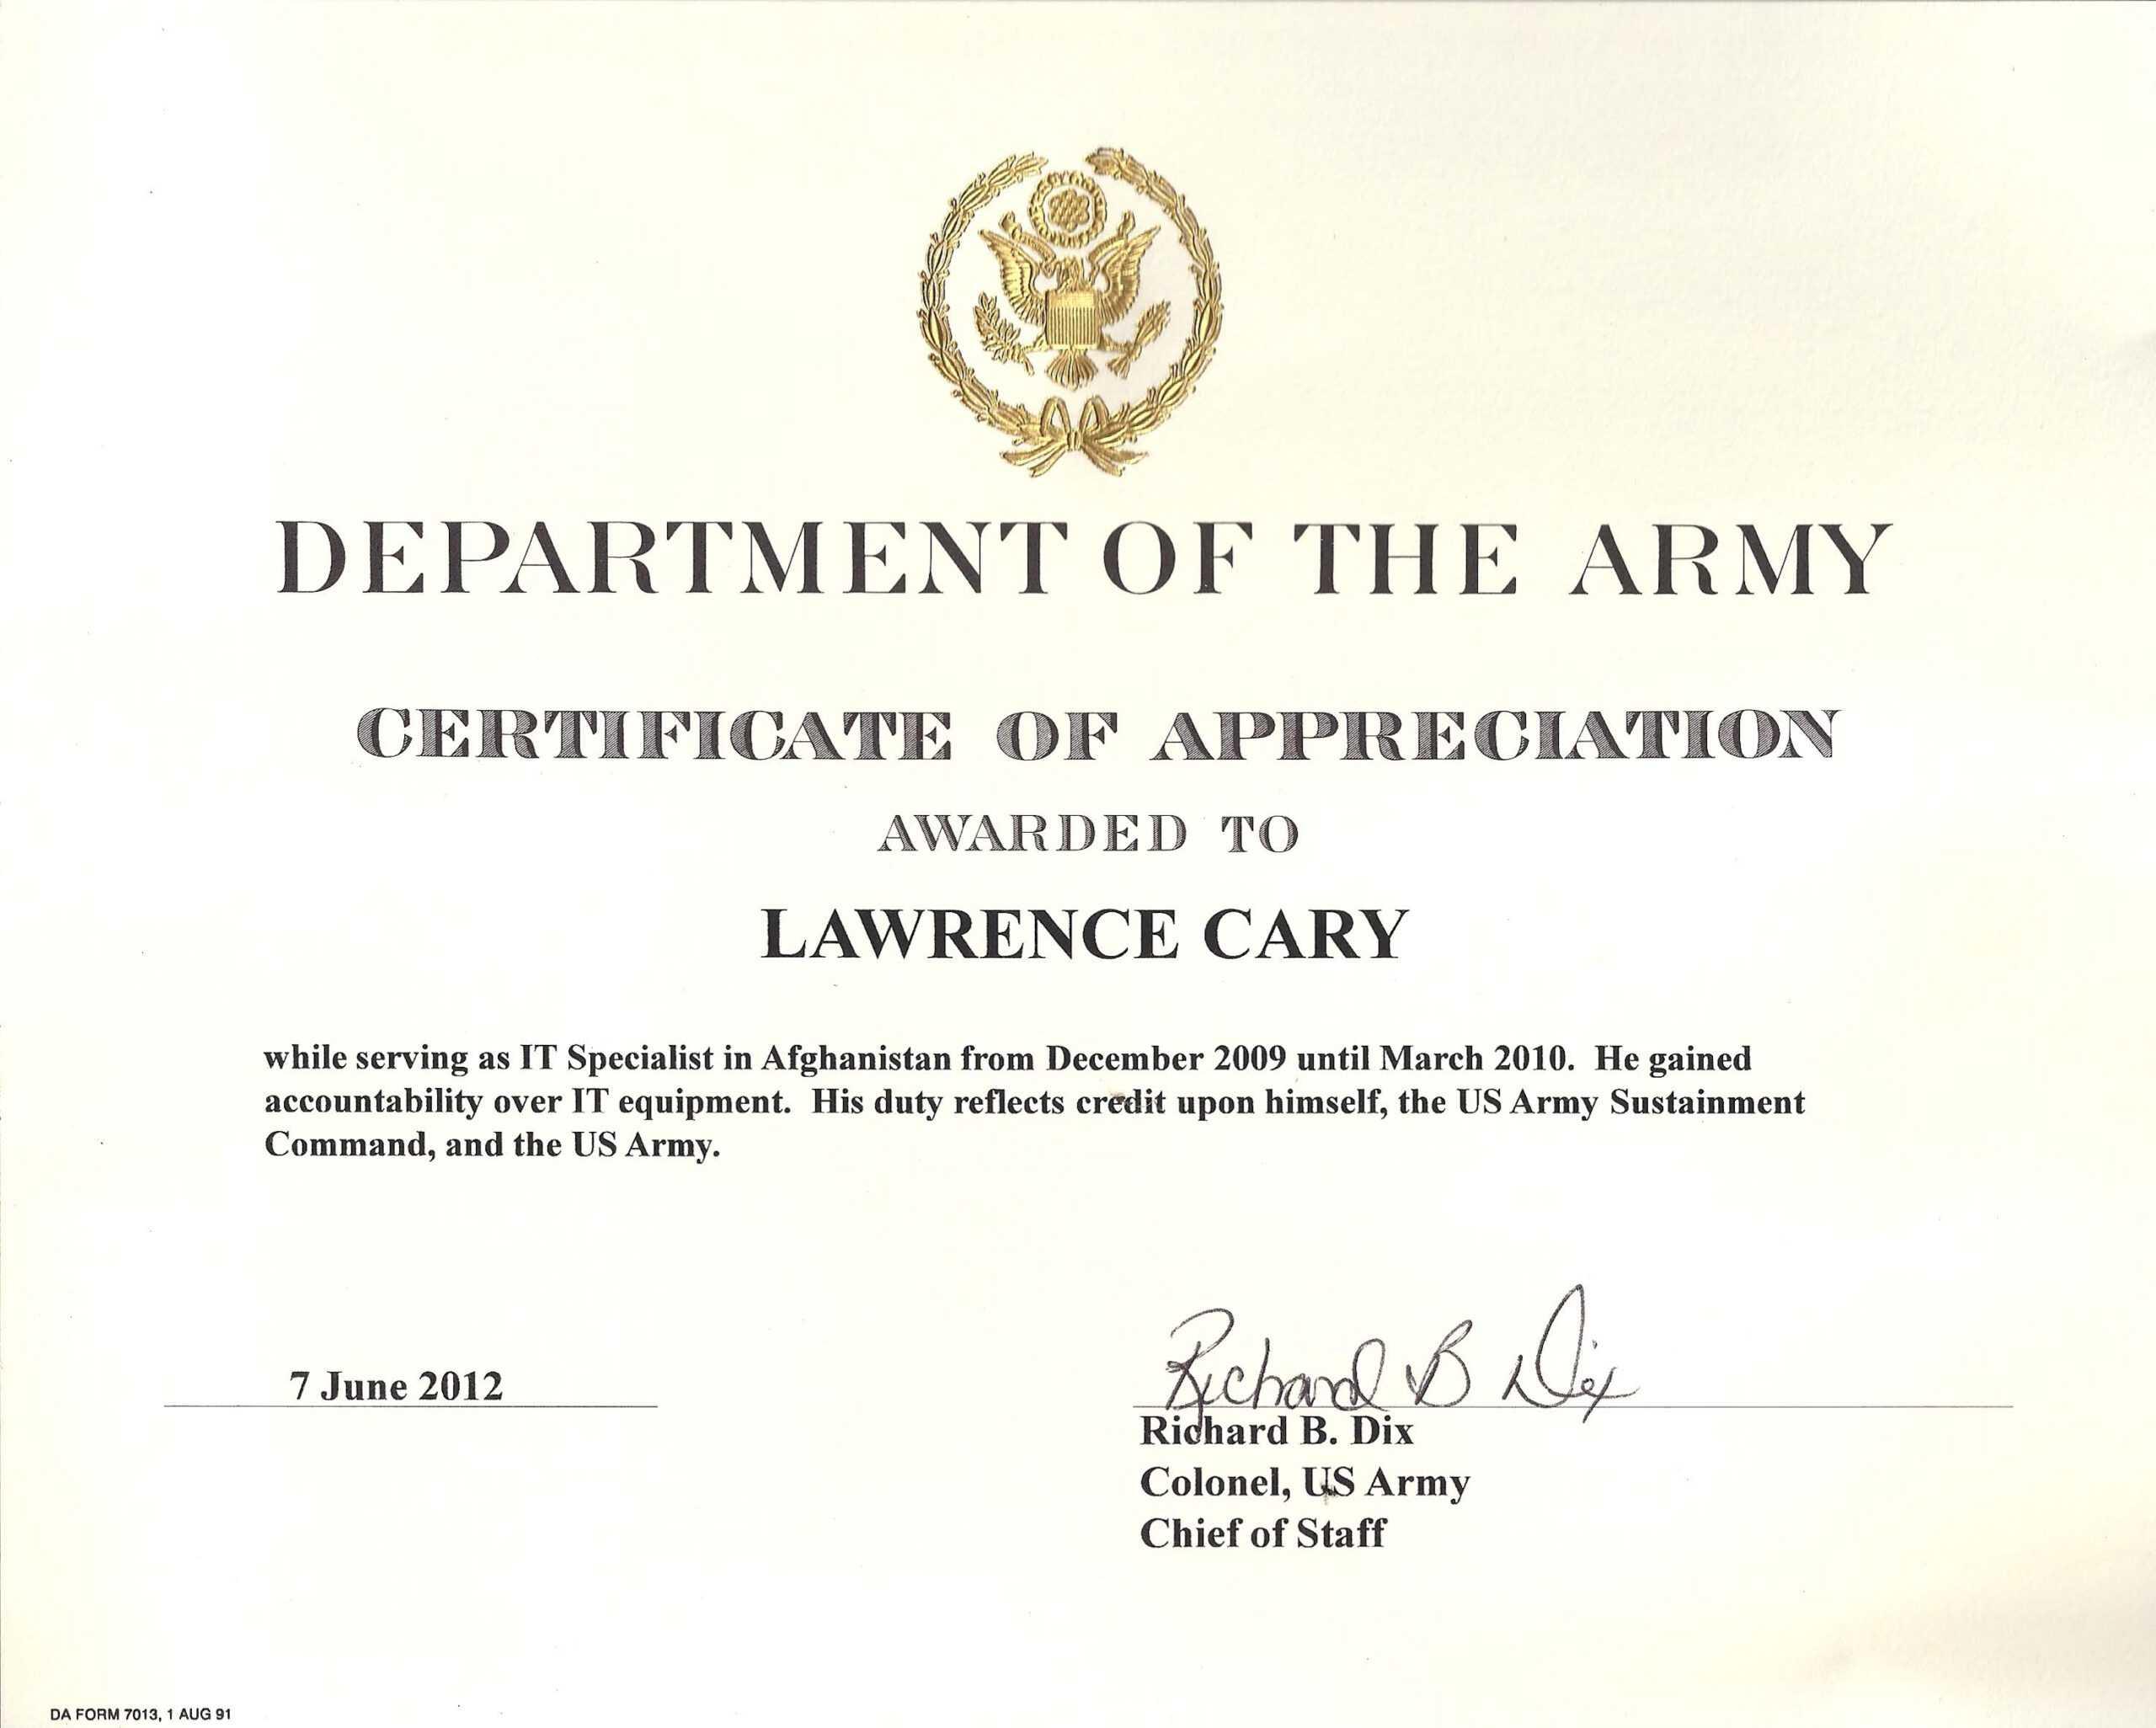 6+ Army Appreciation Certificate Templates - Pdf, Docx Regarding Certificate Of Achievement Army Template